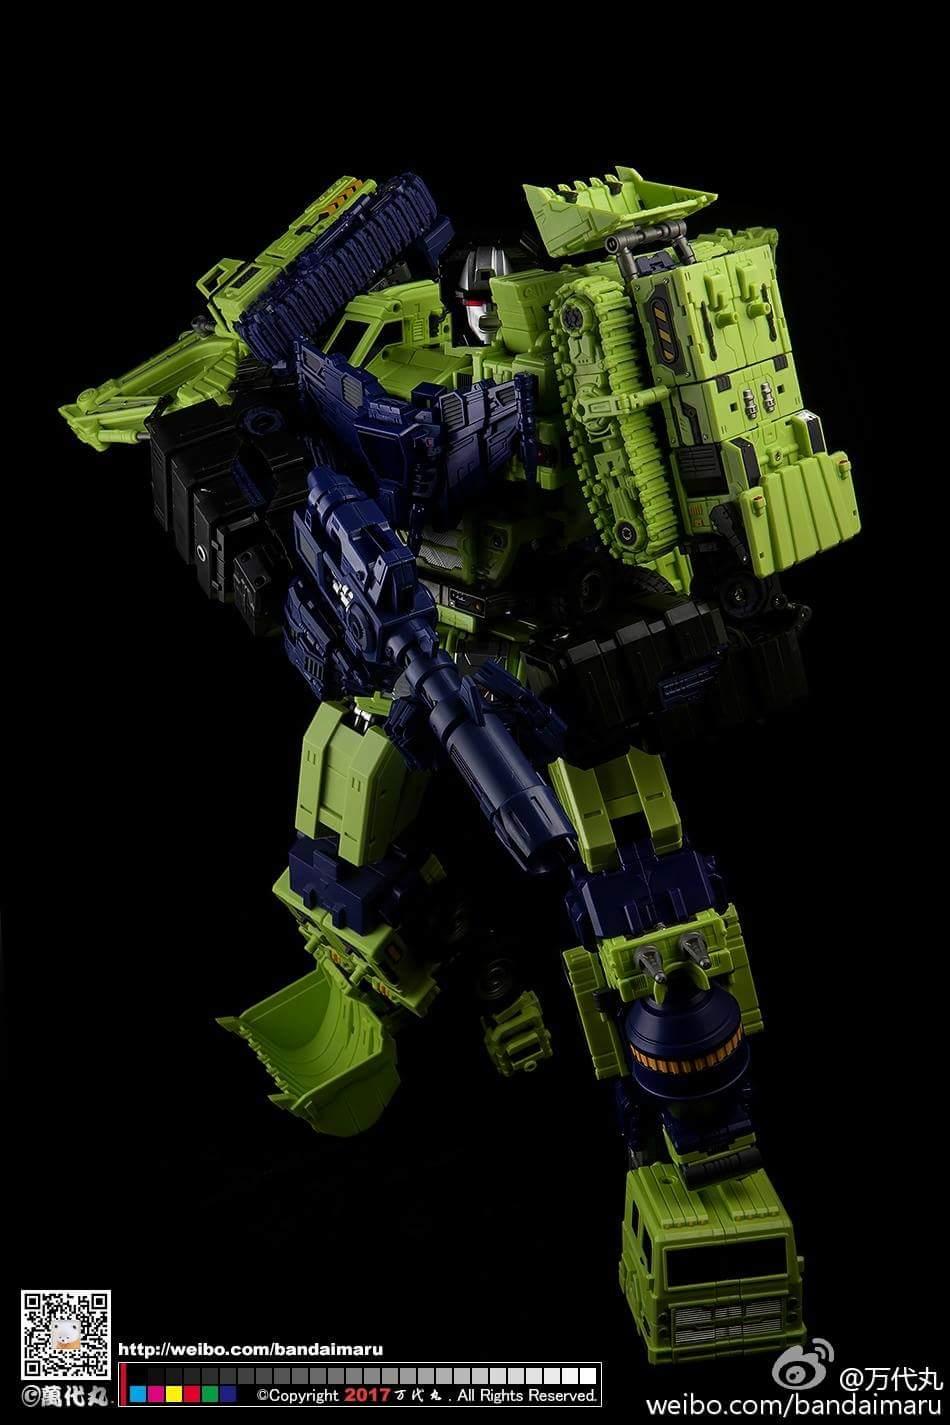 [Toyworld] Produit Tiers - Jouet TW-C Constructor aka Devastator/Dévastateur (Version vert G1 et jaune G2) - Page 9 F49NVOxh